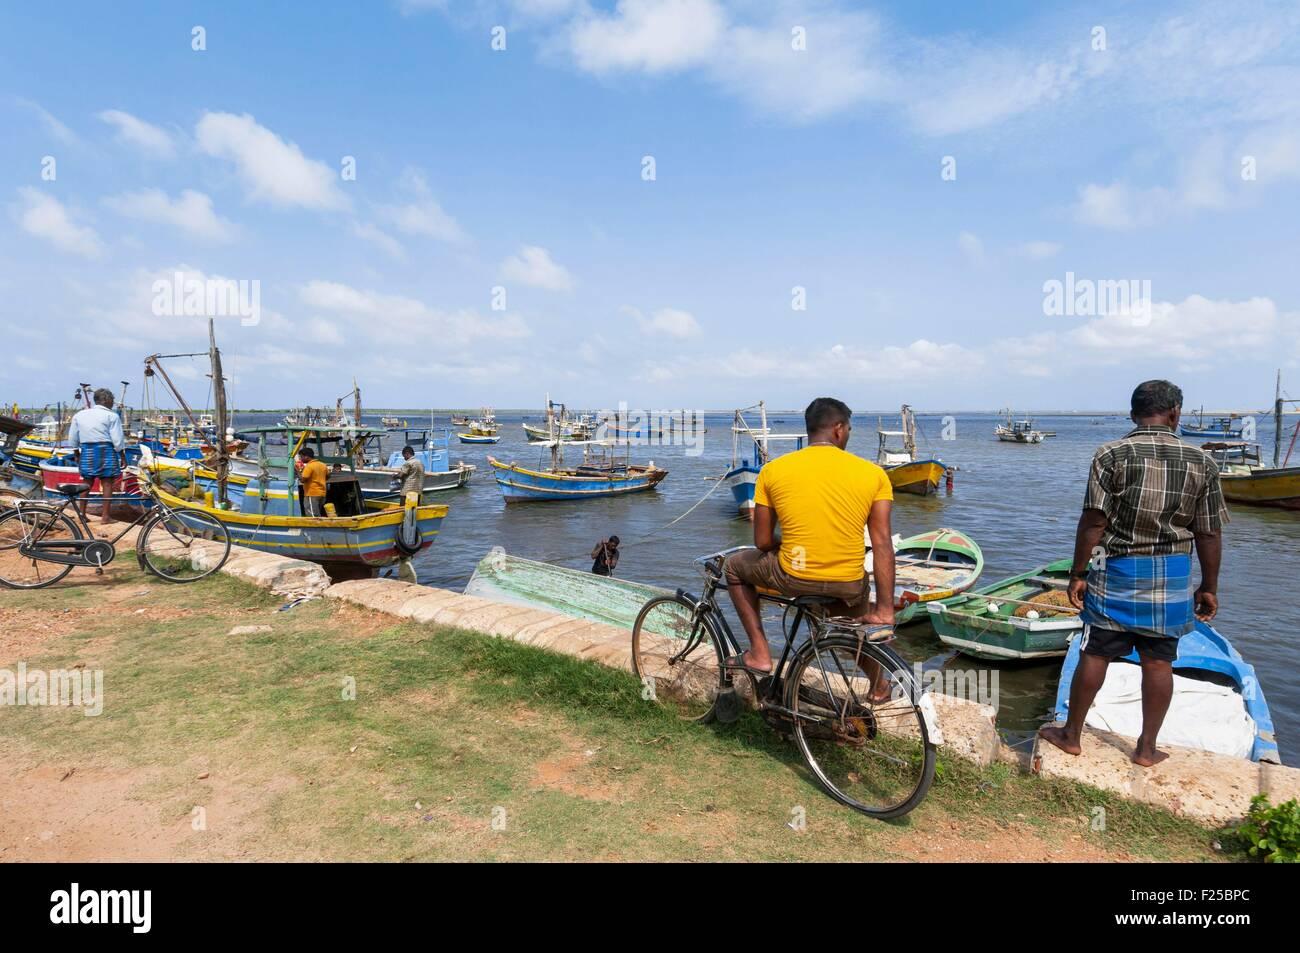 Sri Lanka, Northern Province, Jaffna region, fisher harbour in town - Stock Image